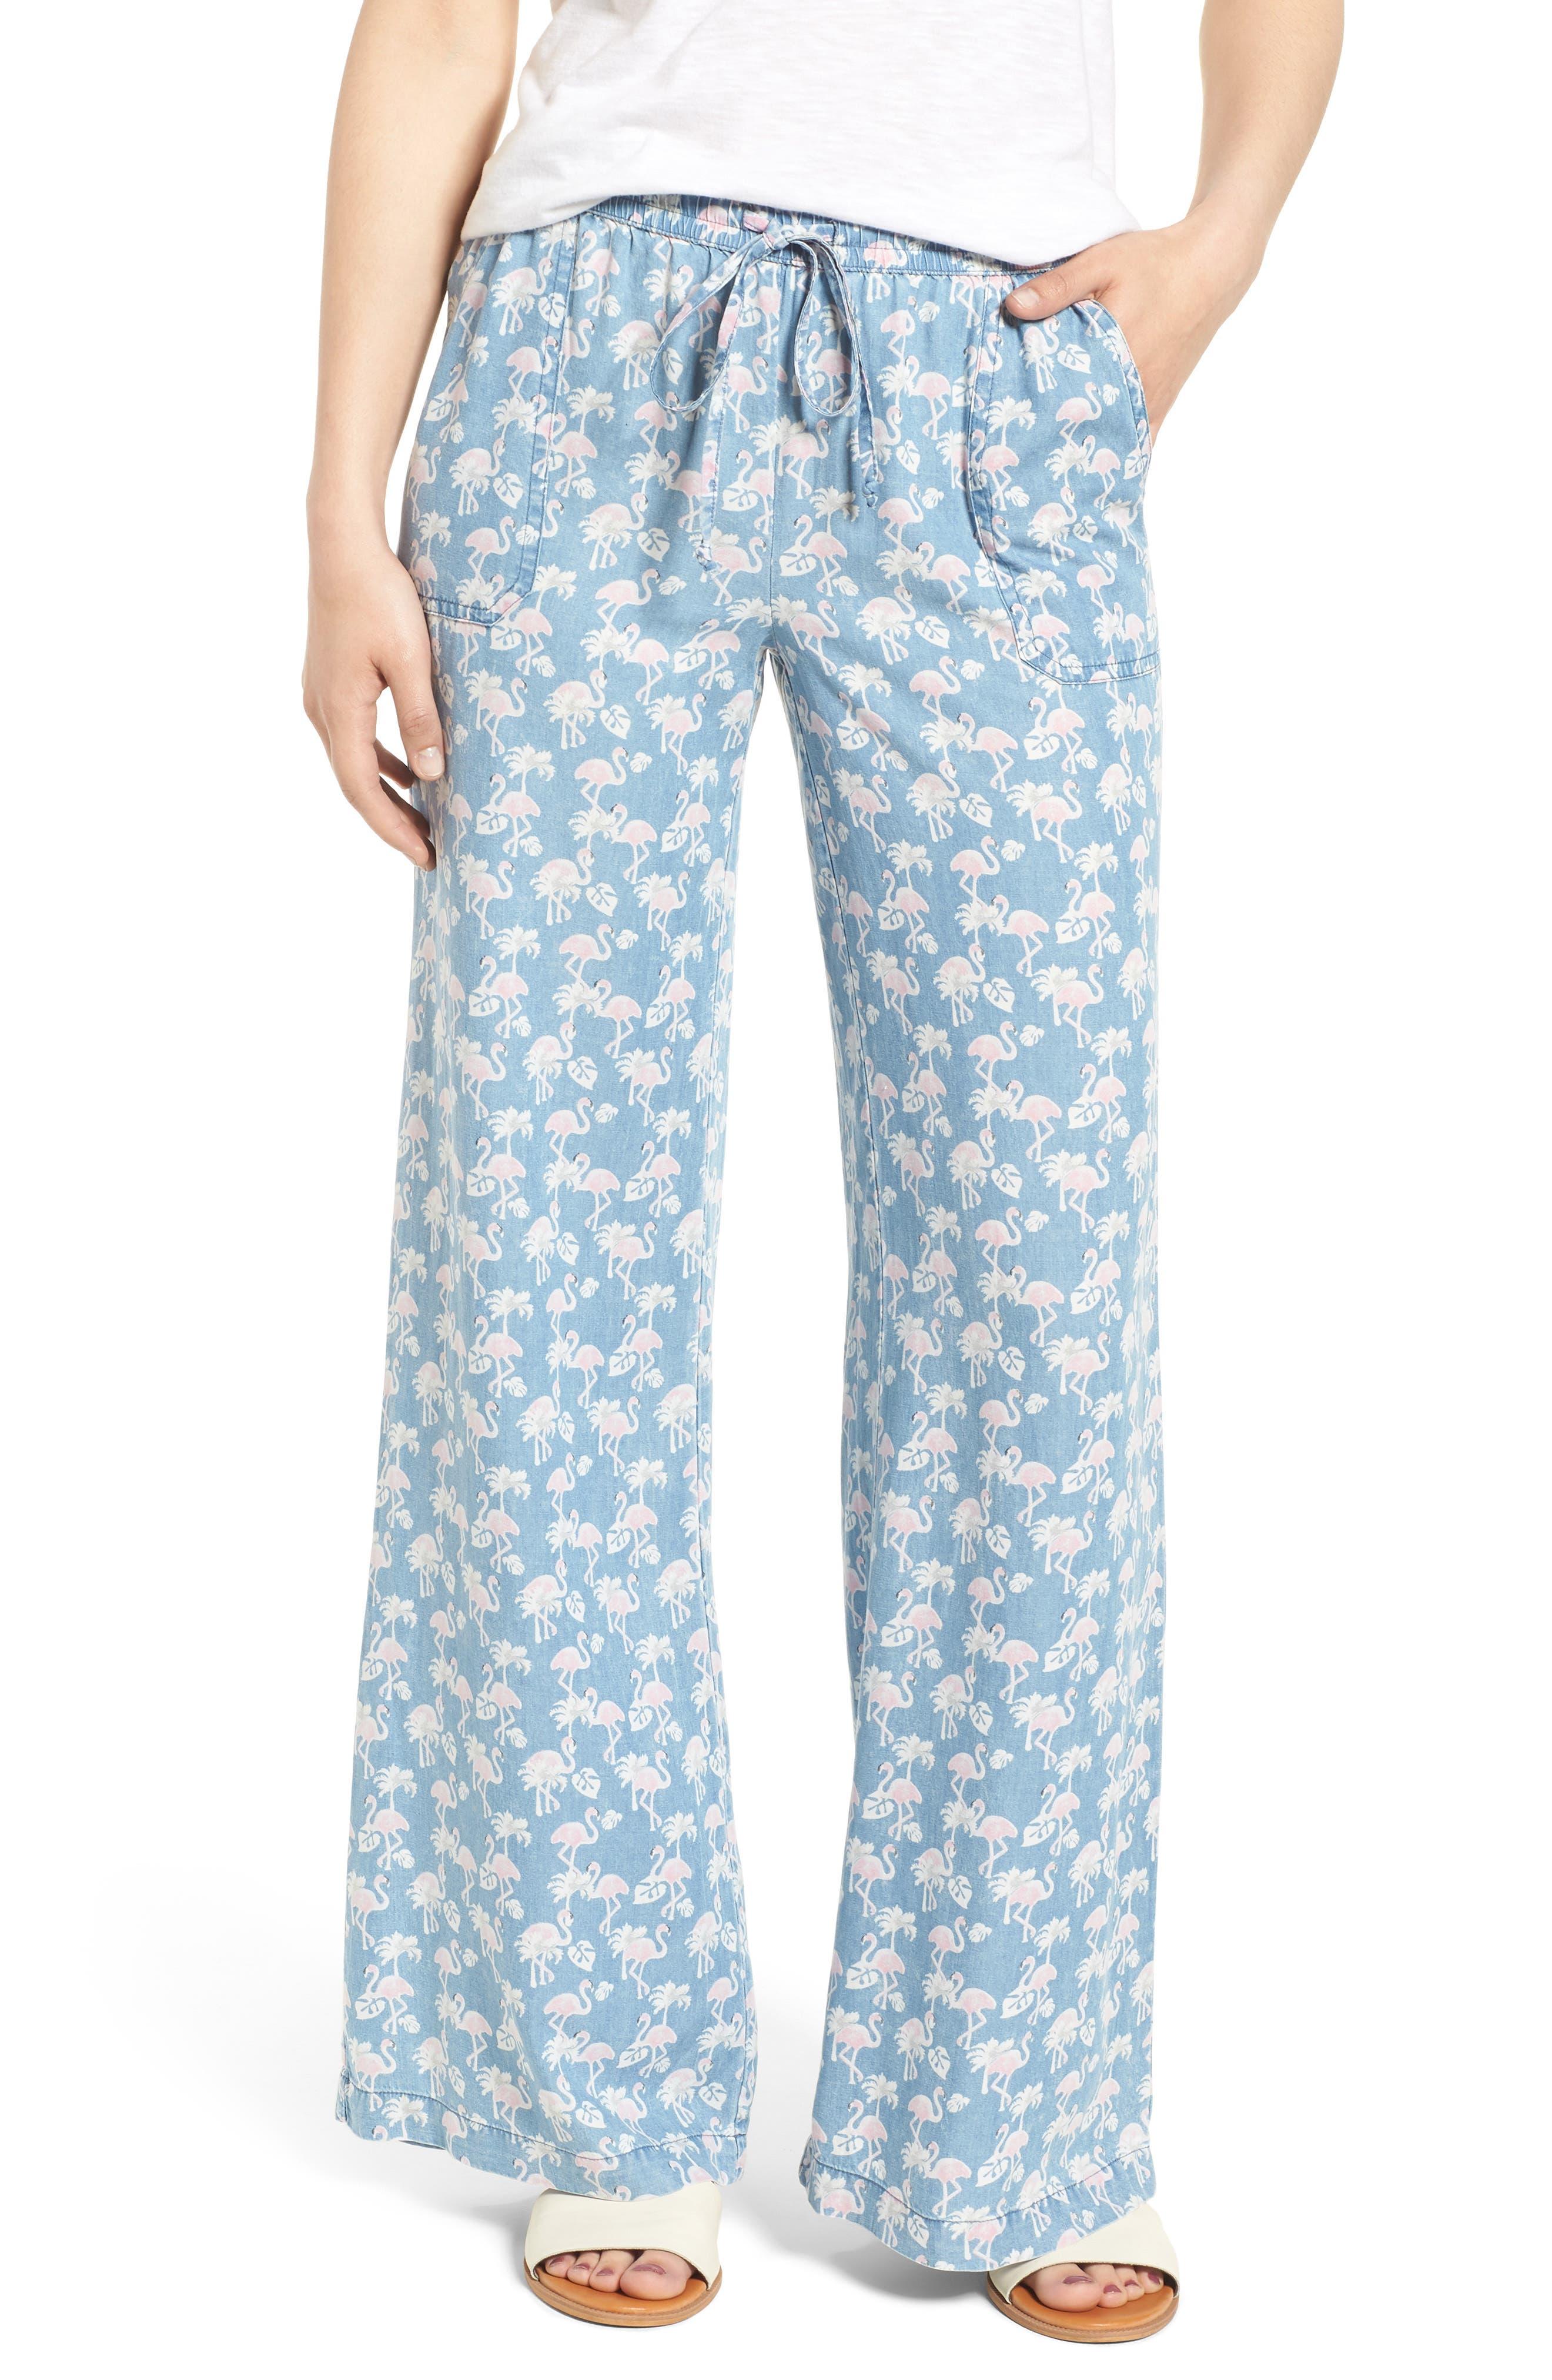 Pink Flamingo Drawstring Pants,                         Main,                         color, BLUE FLAMINGO